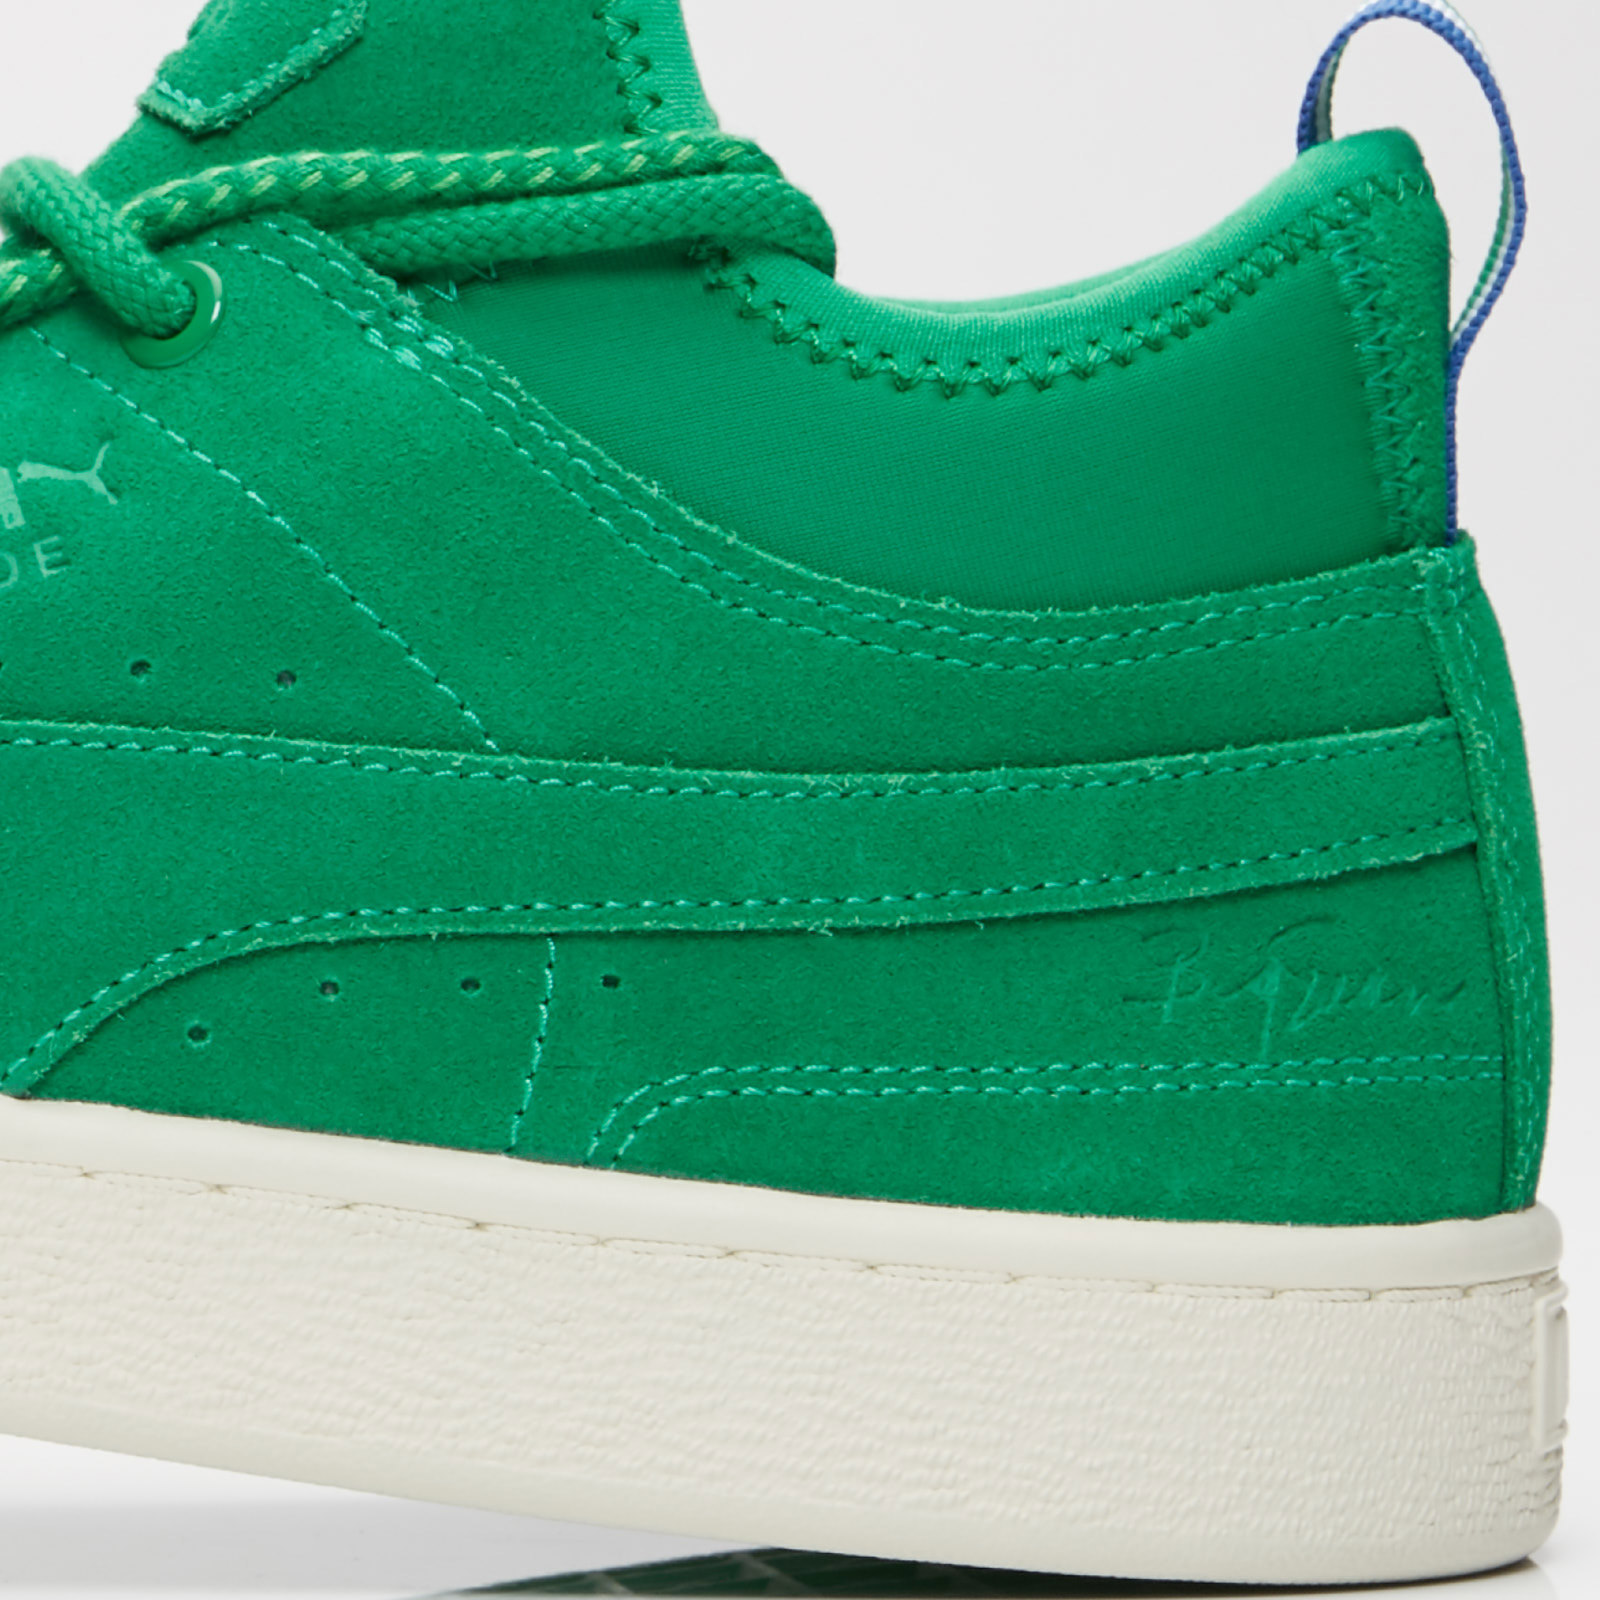 huge selection of 6e083 93321 puma suede mid green Puma Suede Mid x Big Sean - 366252-02 - Sneakersnstuff    sneakers .